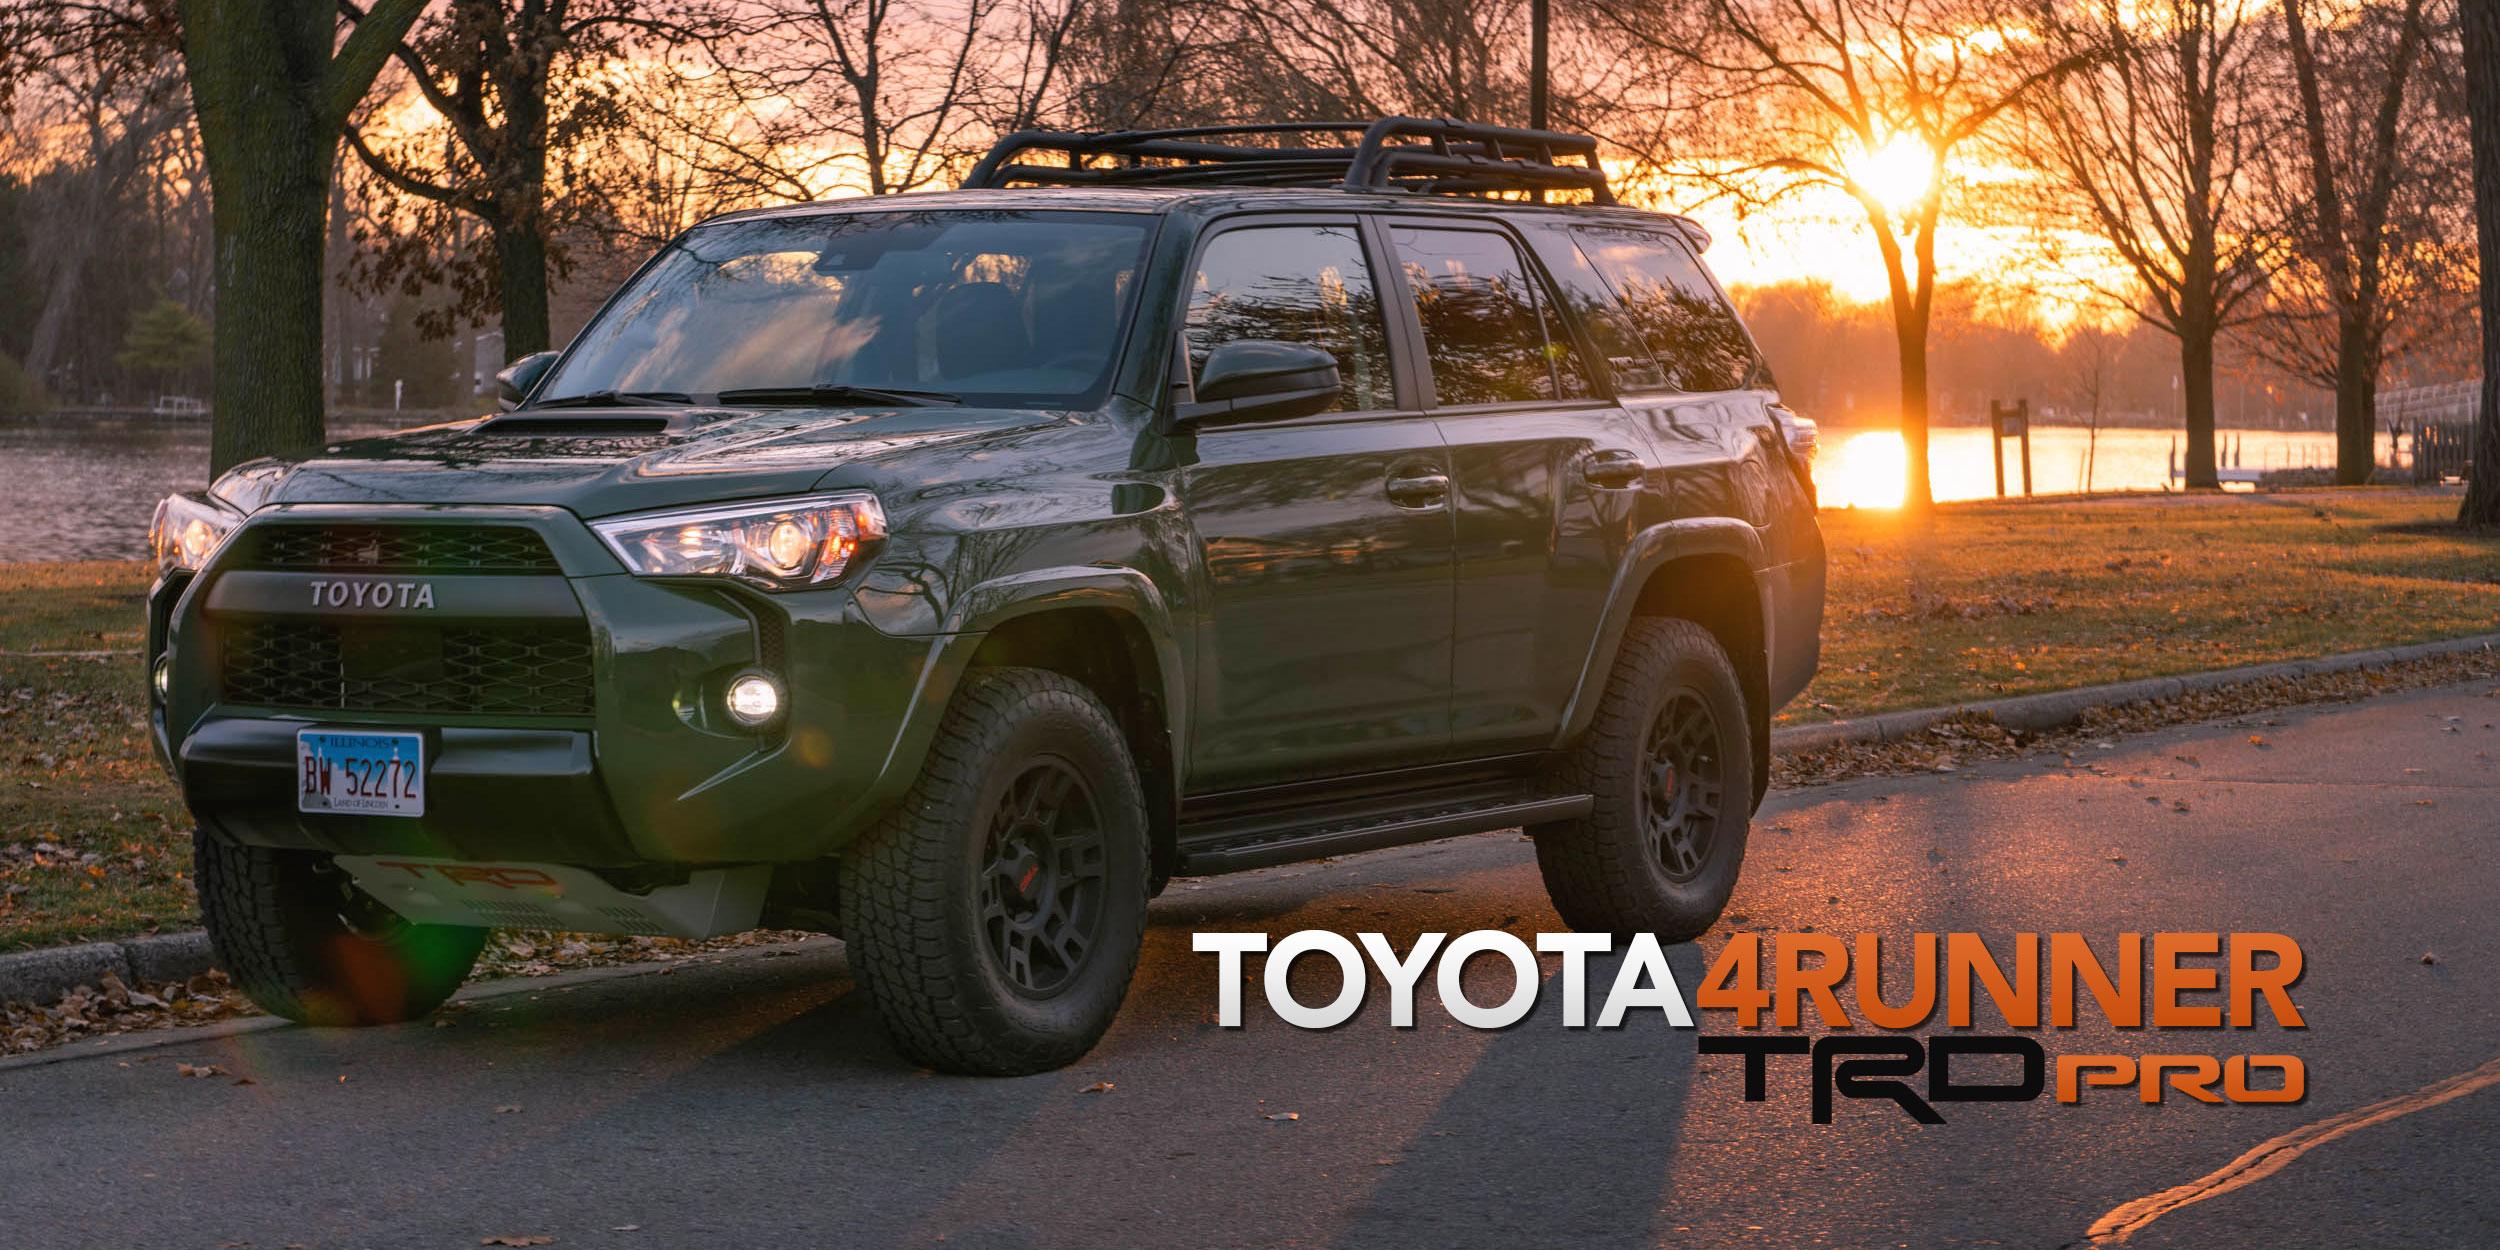 2020 Toyota 4Runner TRD Pro - Toyota's Tonka Truck